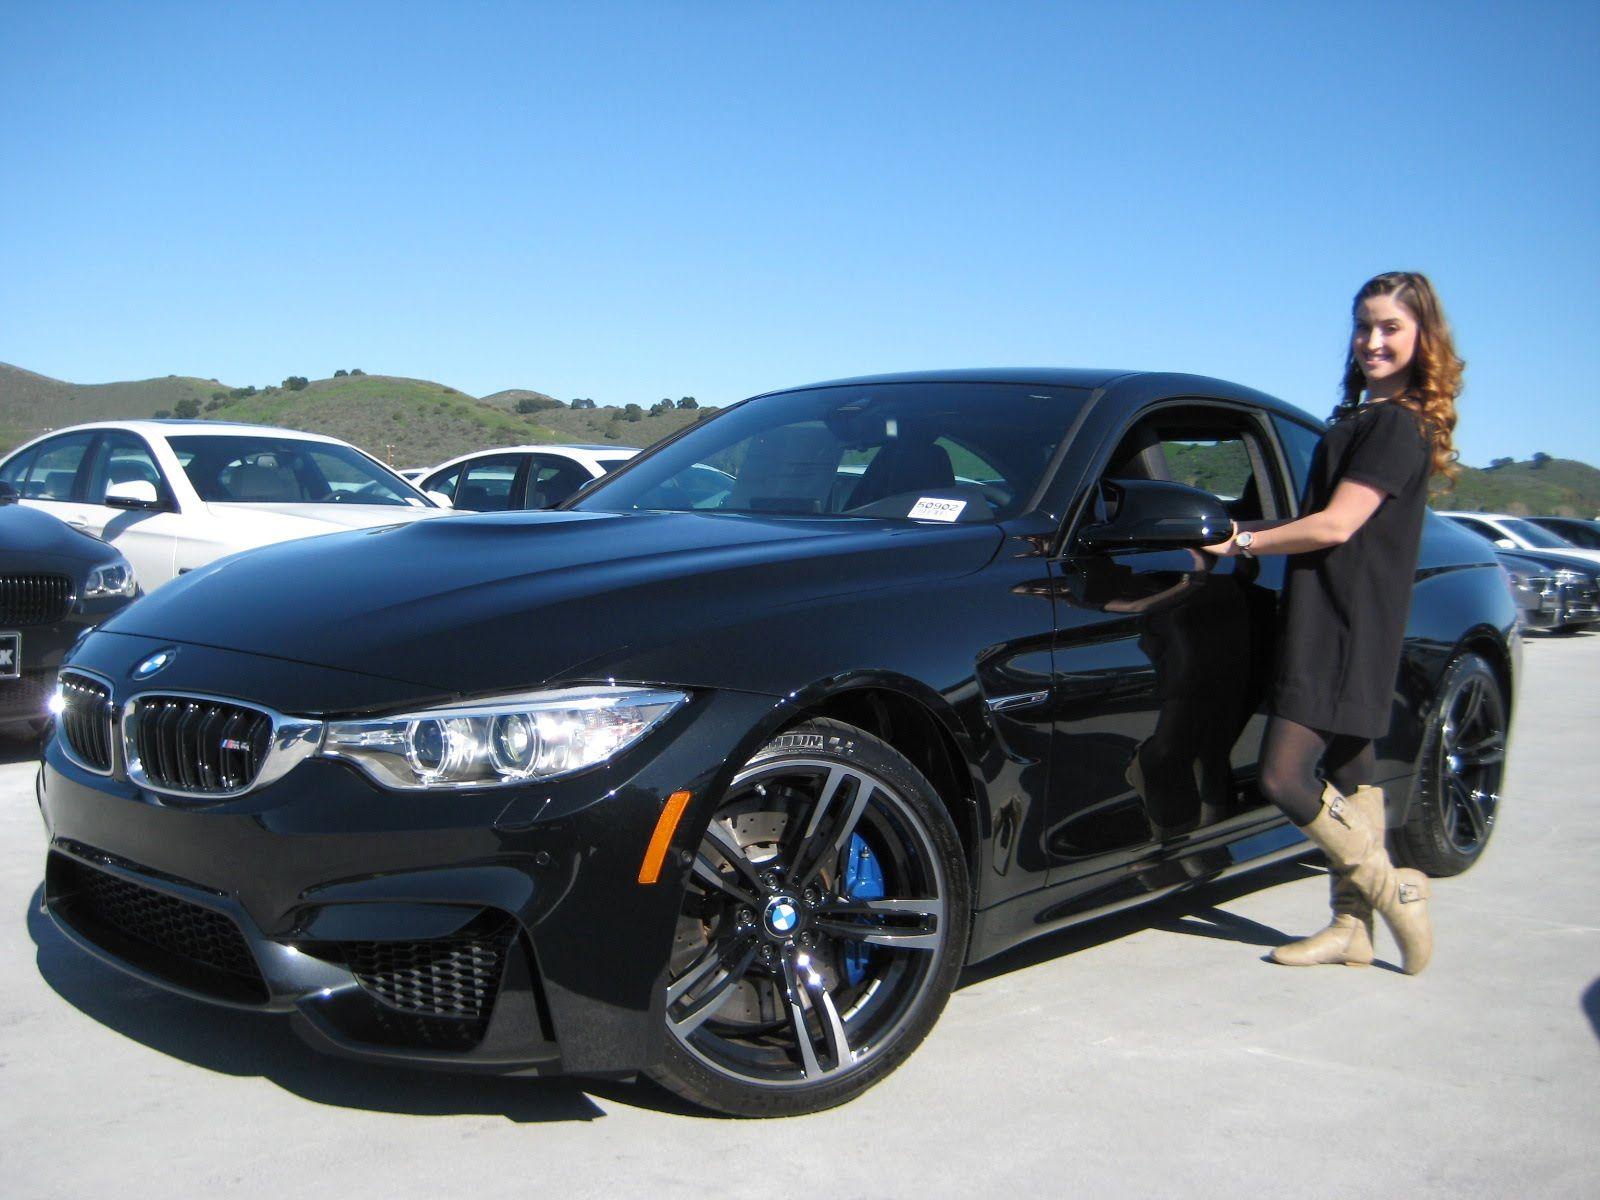 New Bmw M4 With 19 Black M Wheels Exhaust Sound Full Review New Bmw Bmw M4 Bmw